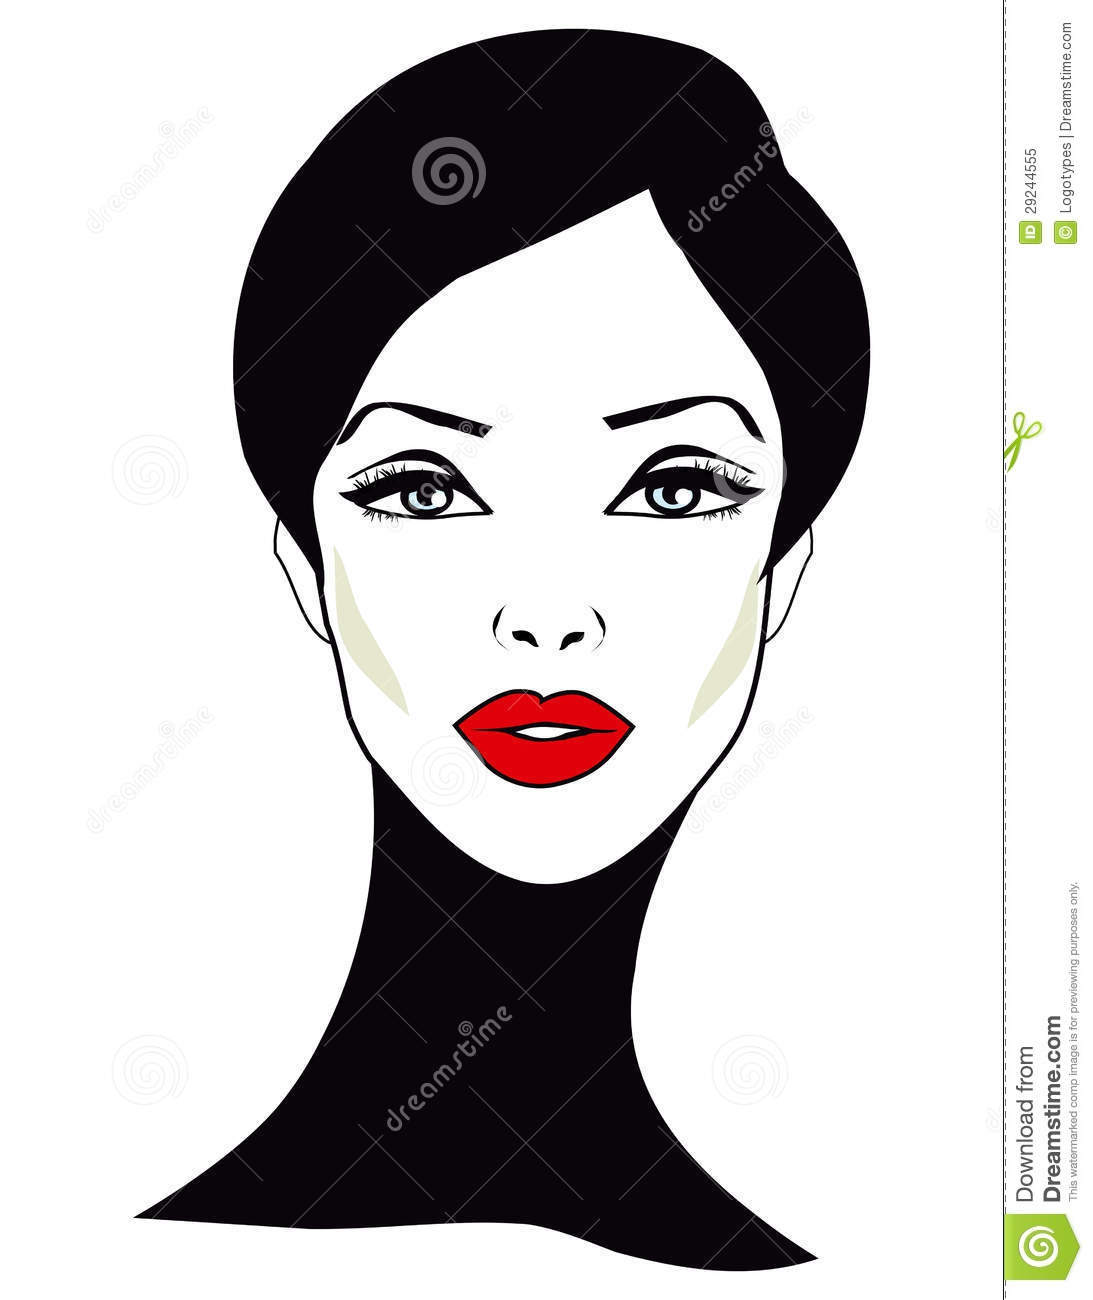 Woman Face Clipart#1870890.